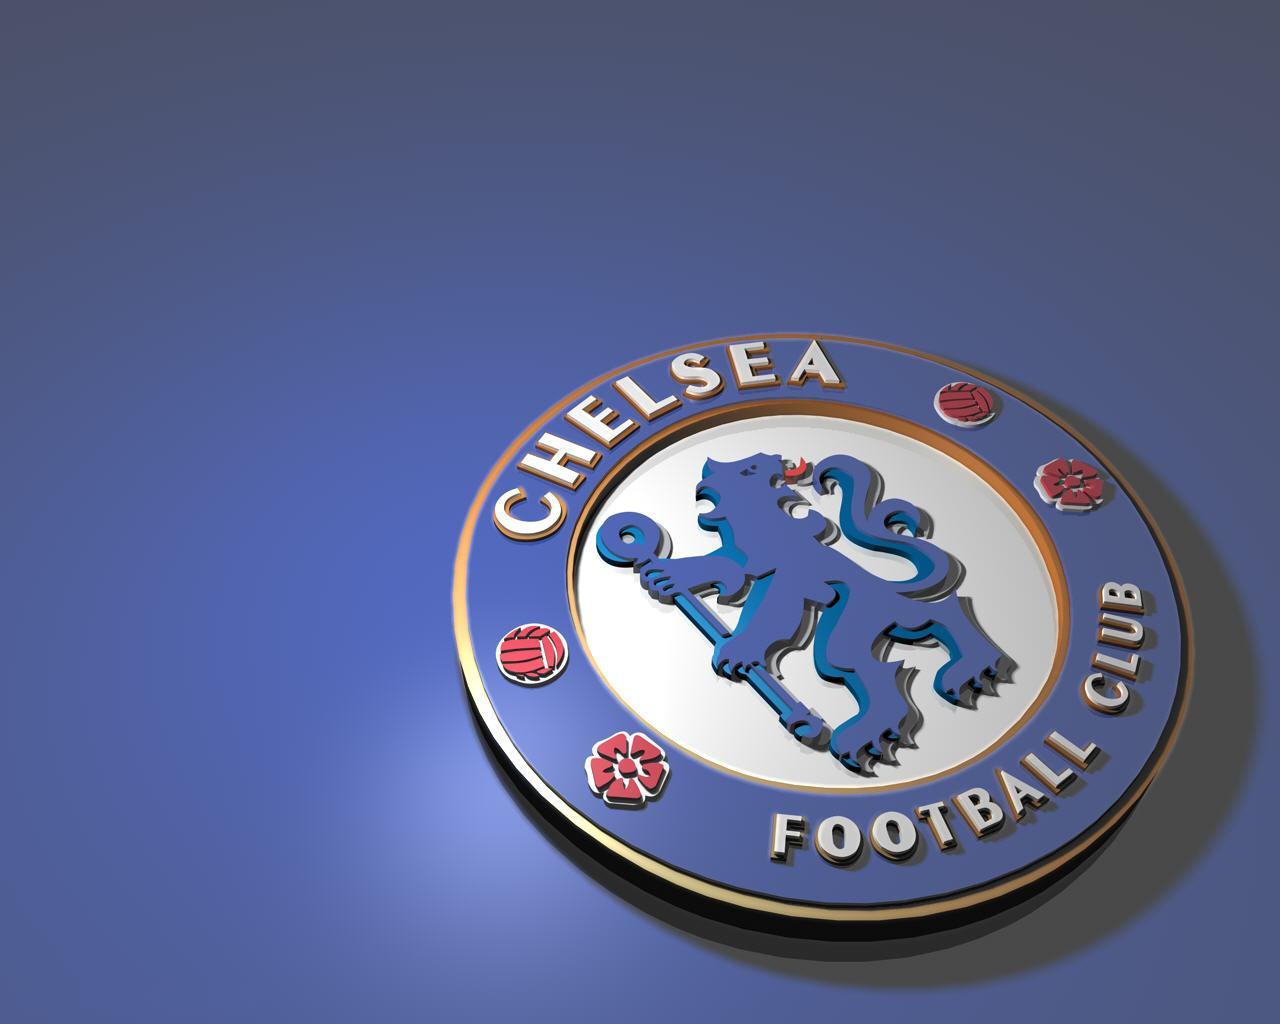 1001 WALLPAPER: Logo Chelsea F.C. (Chelsea Football Club